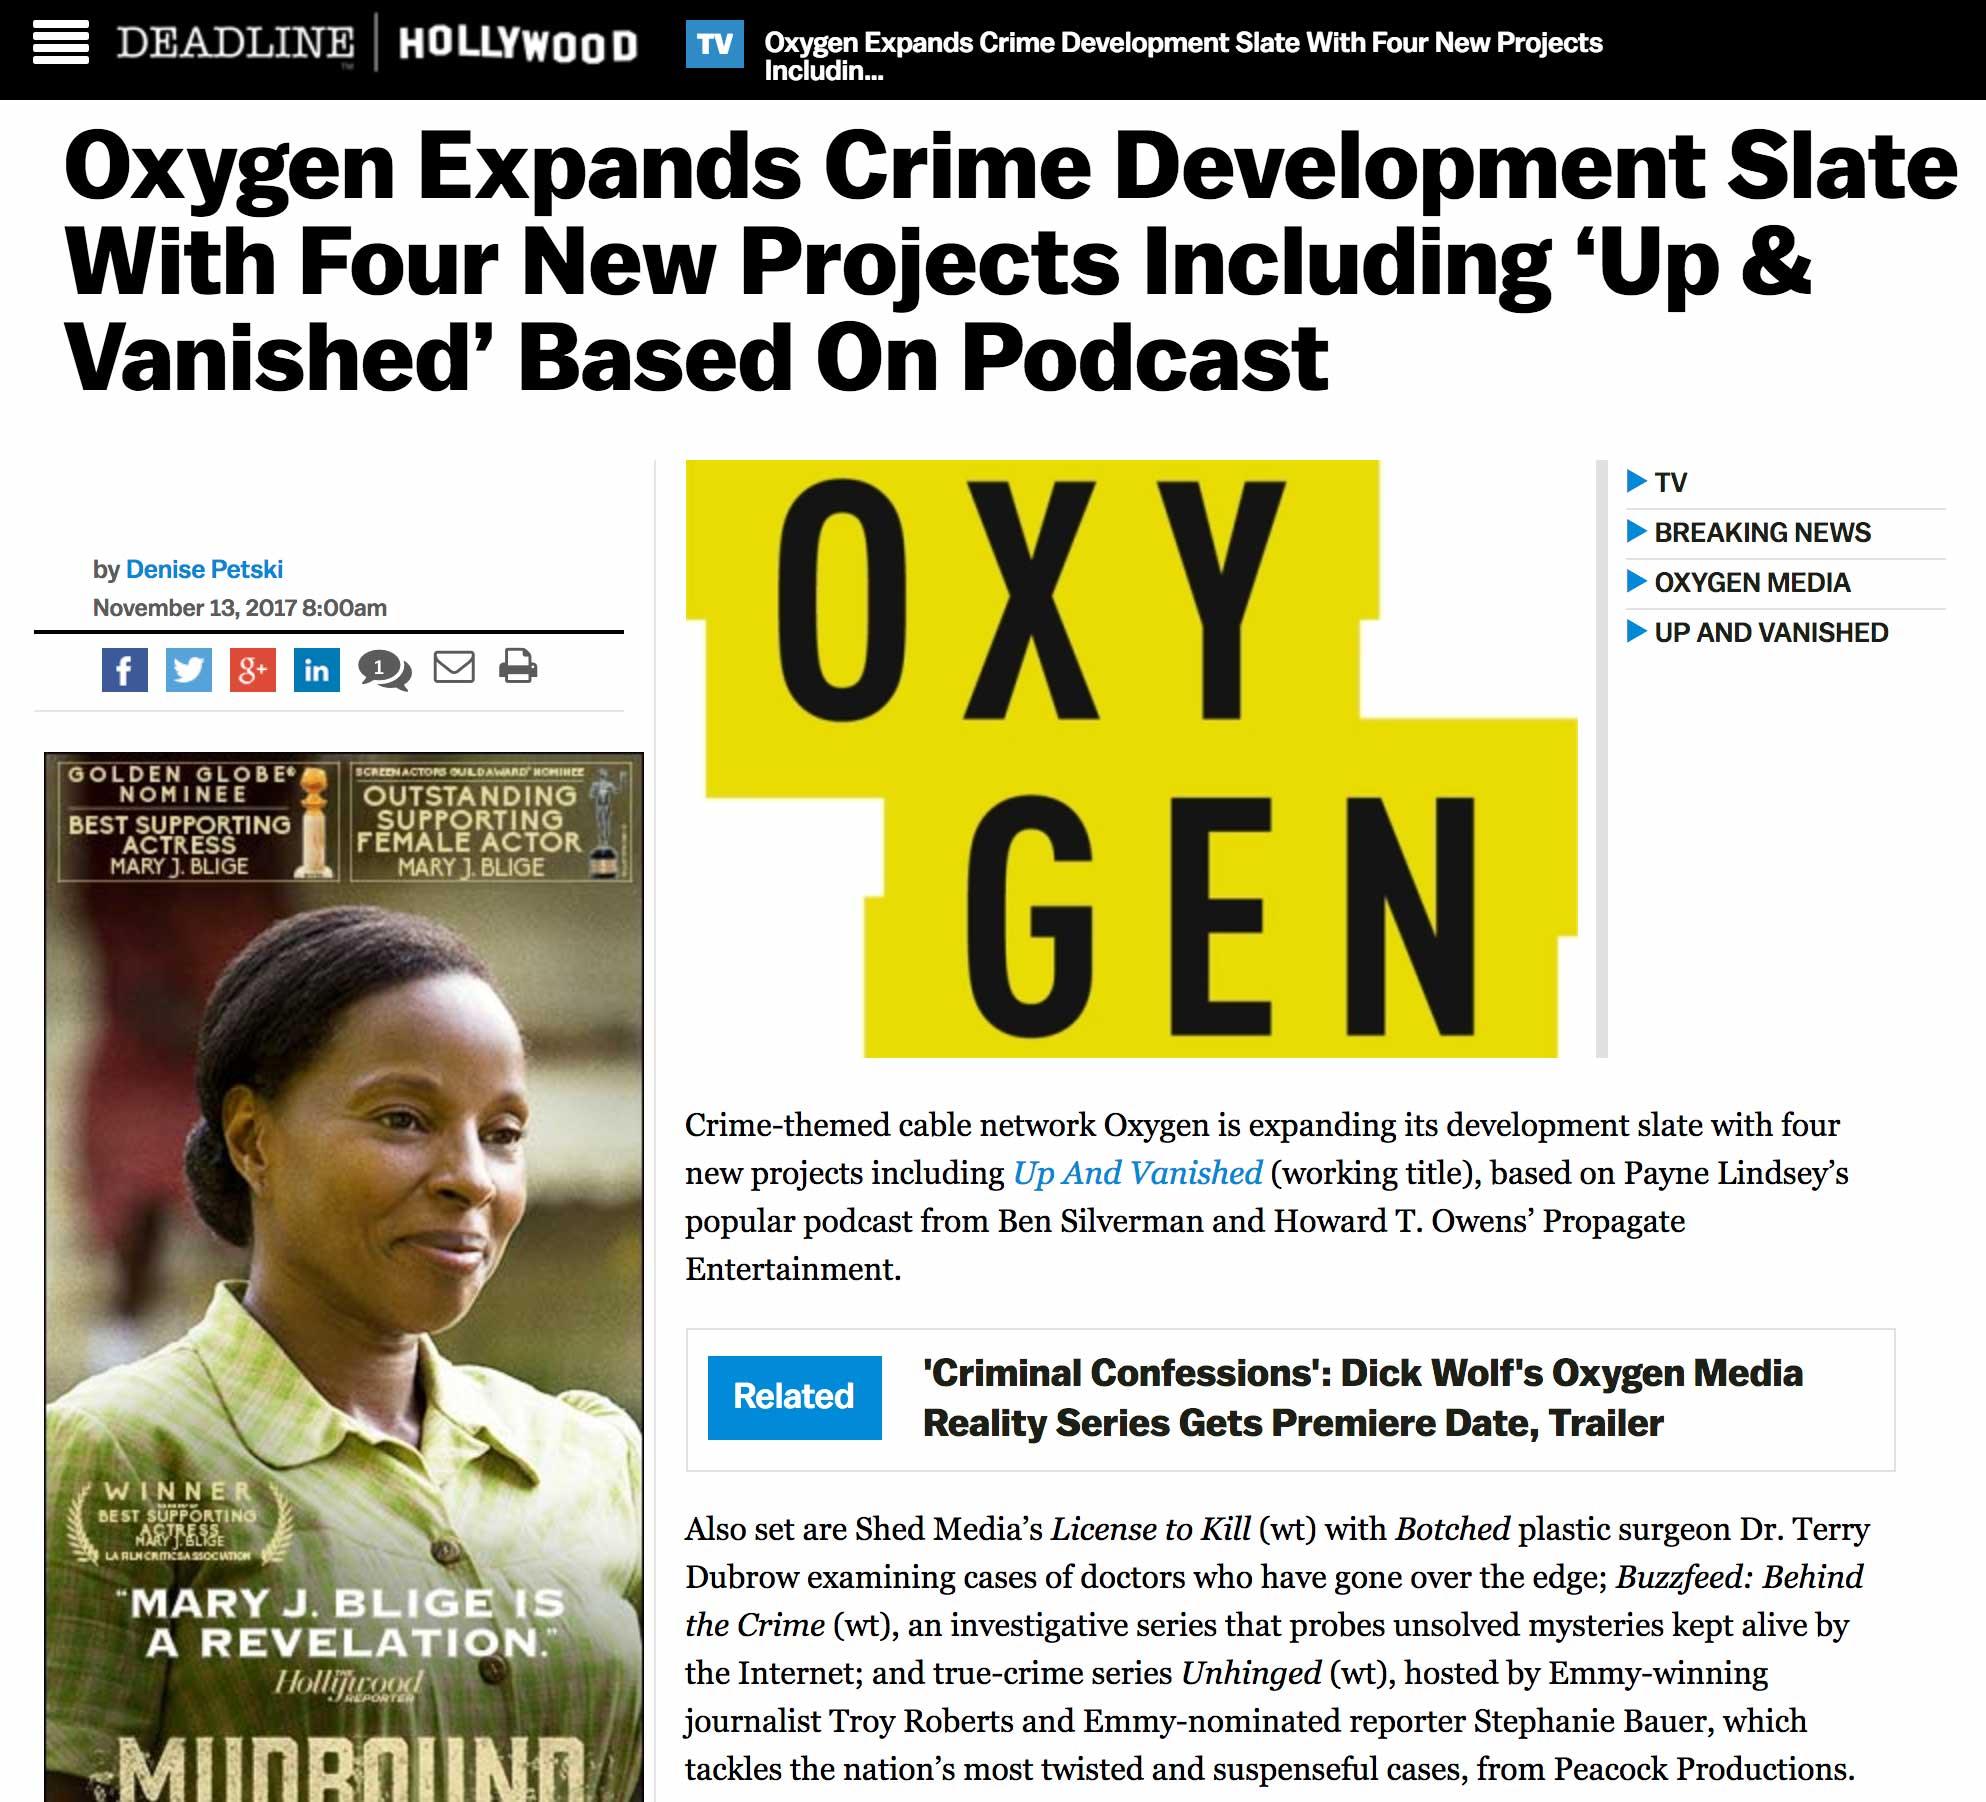 Oxygen Network Signs UAV for TV Series